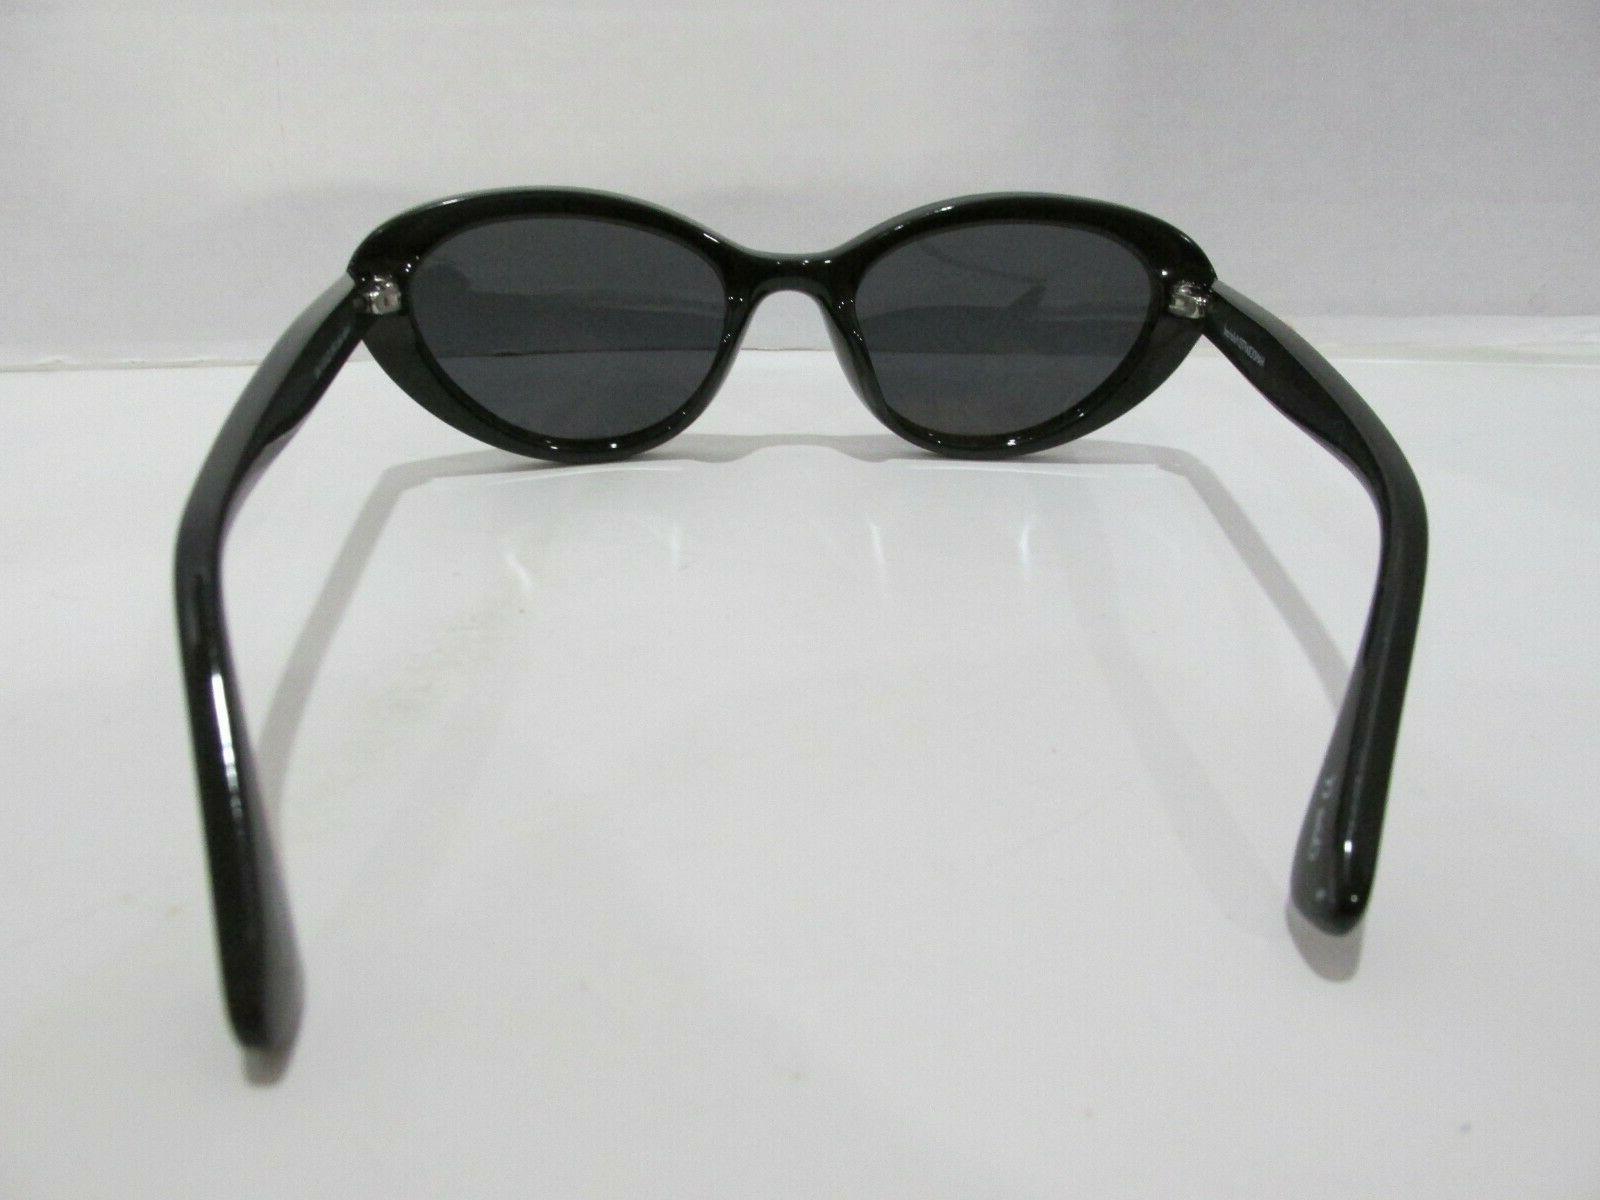 Prive Revaux Job Sunglasses New W/ Cleaner